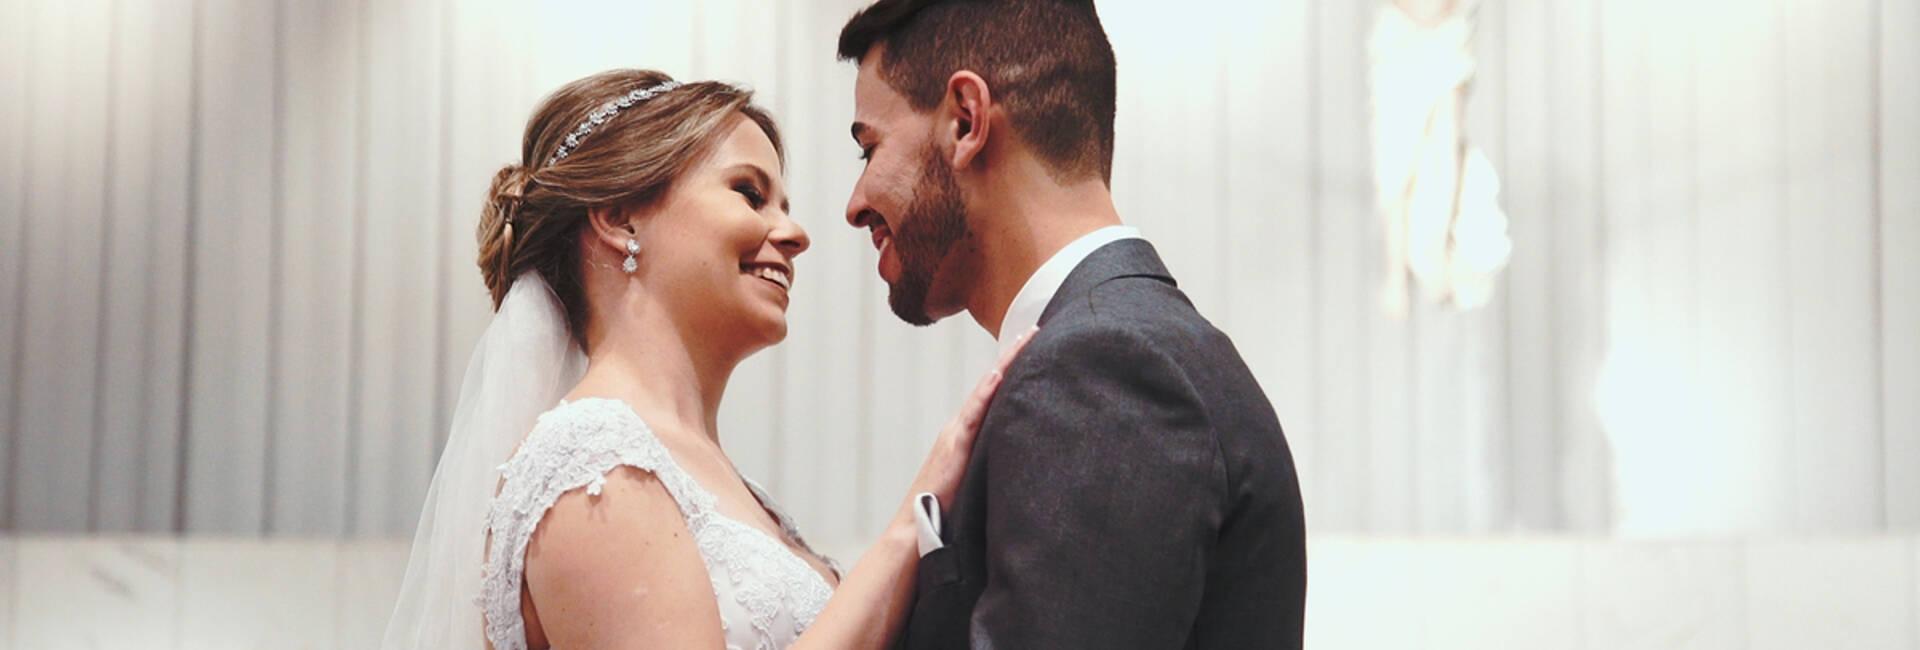 Trailer de Casamento de Gabriela e Renato